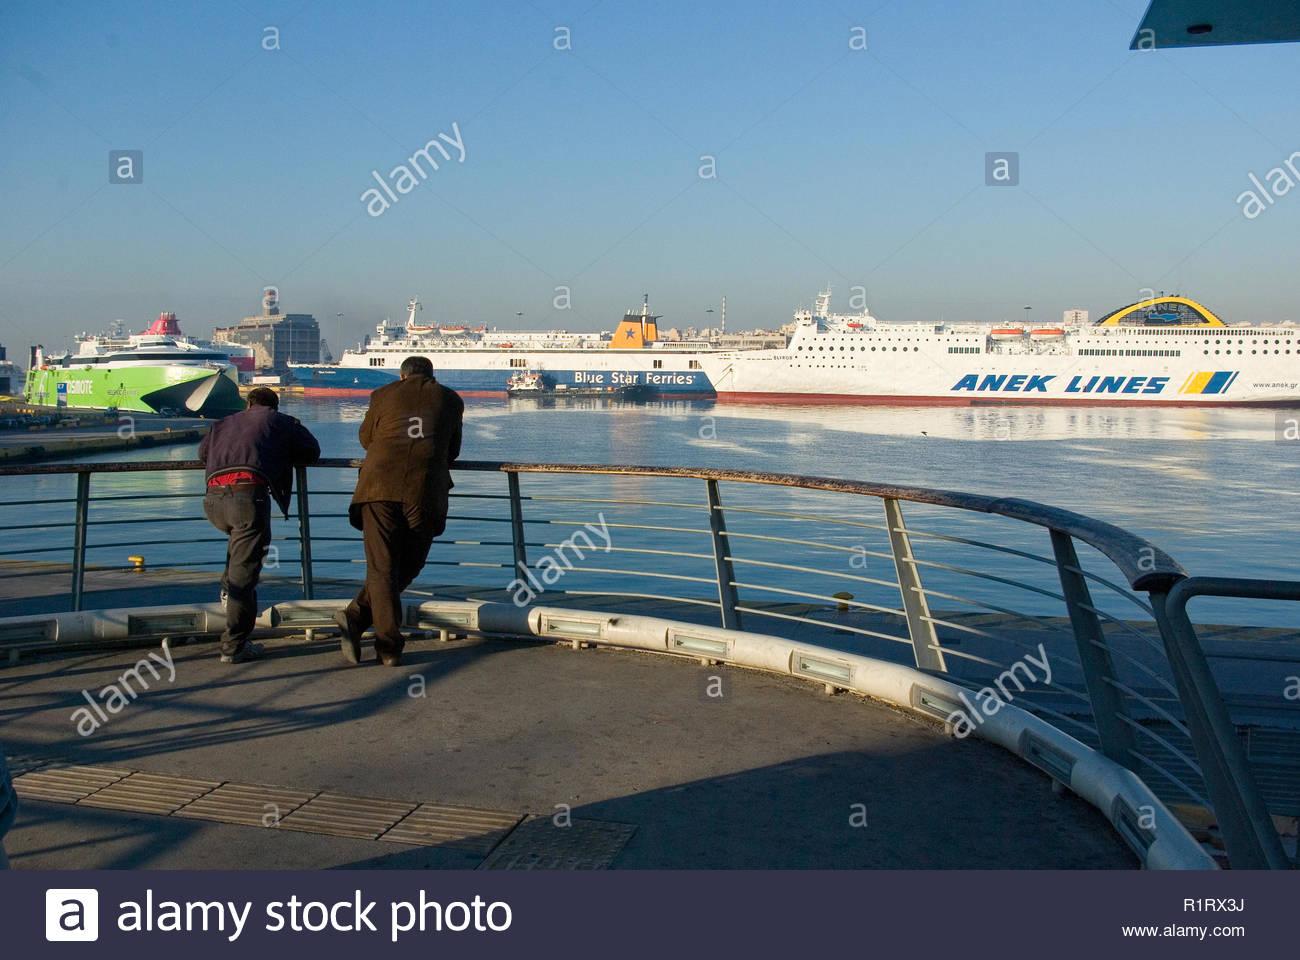 REFUGEES WATCHING THE SHIPS DEPARTING, PIREAUS, GREECE - Stock Image